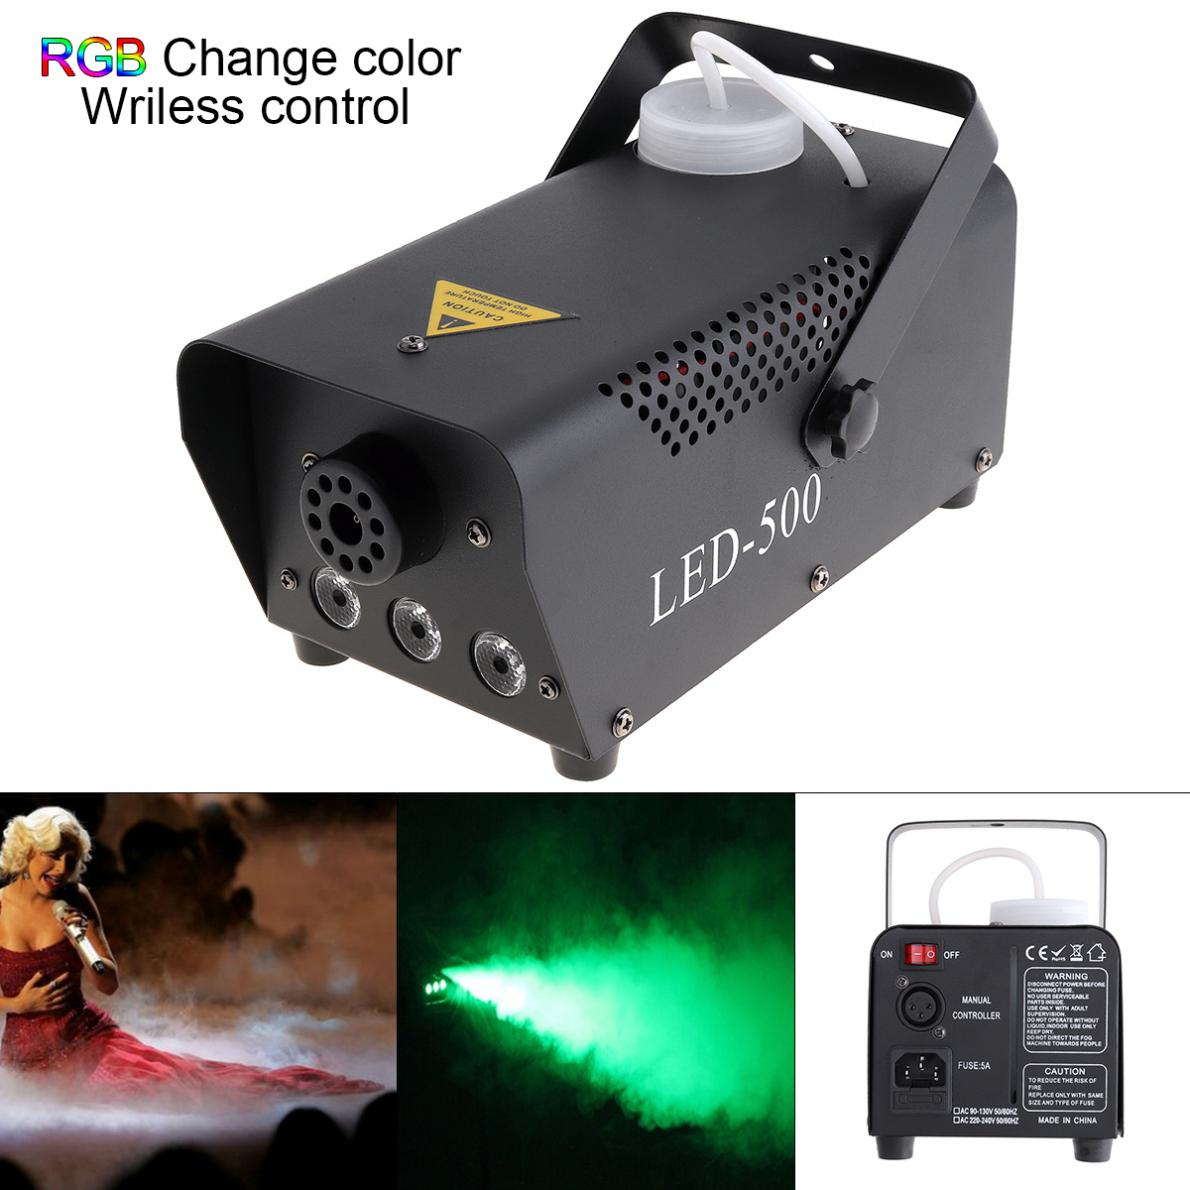 Fog Machine Wireless Control LED 500W RGB Color LED Fog Machine / Professional LED Fogger / Stage Ejector For Bar / KTV